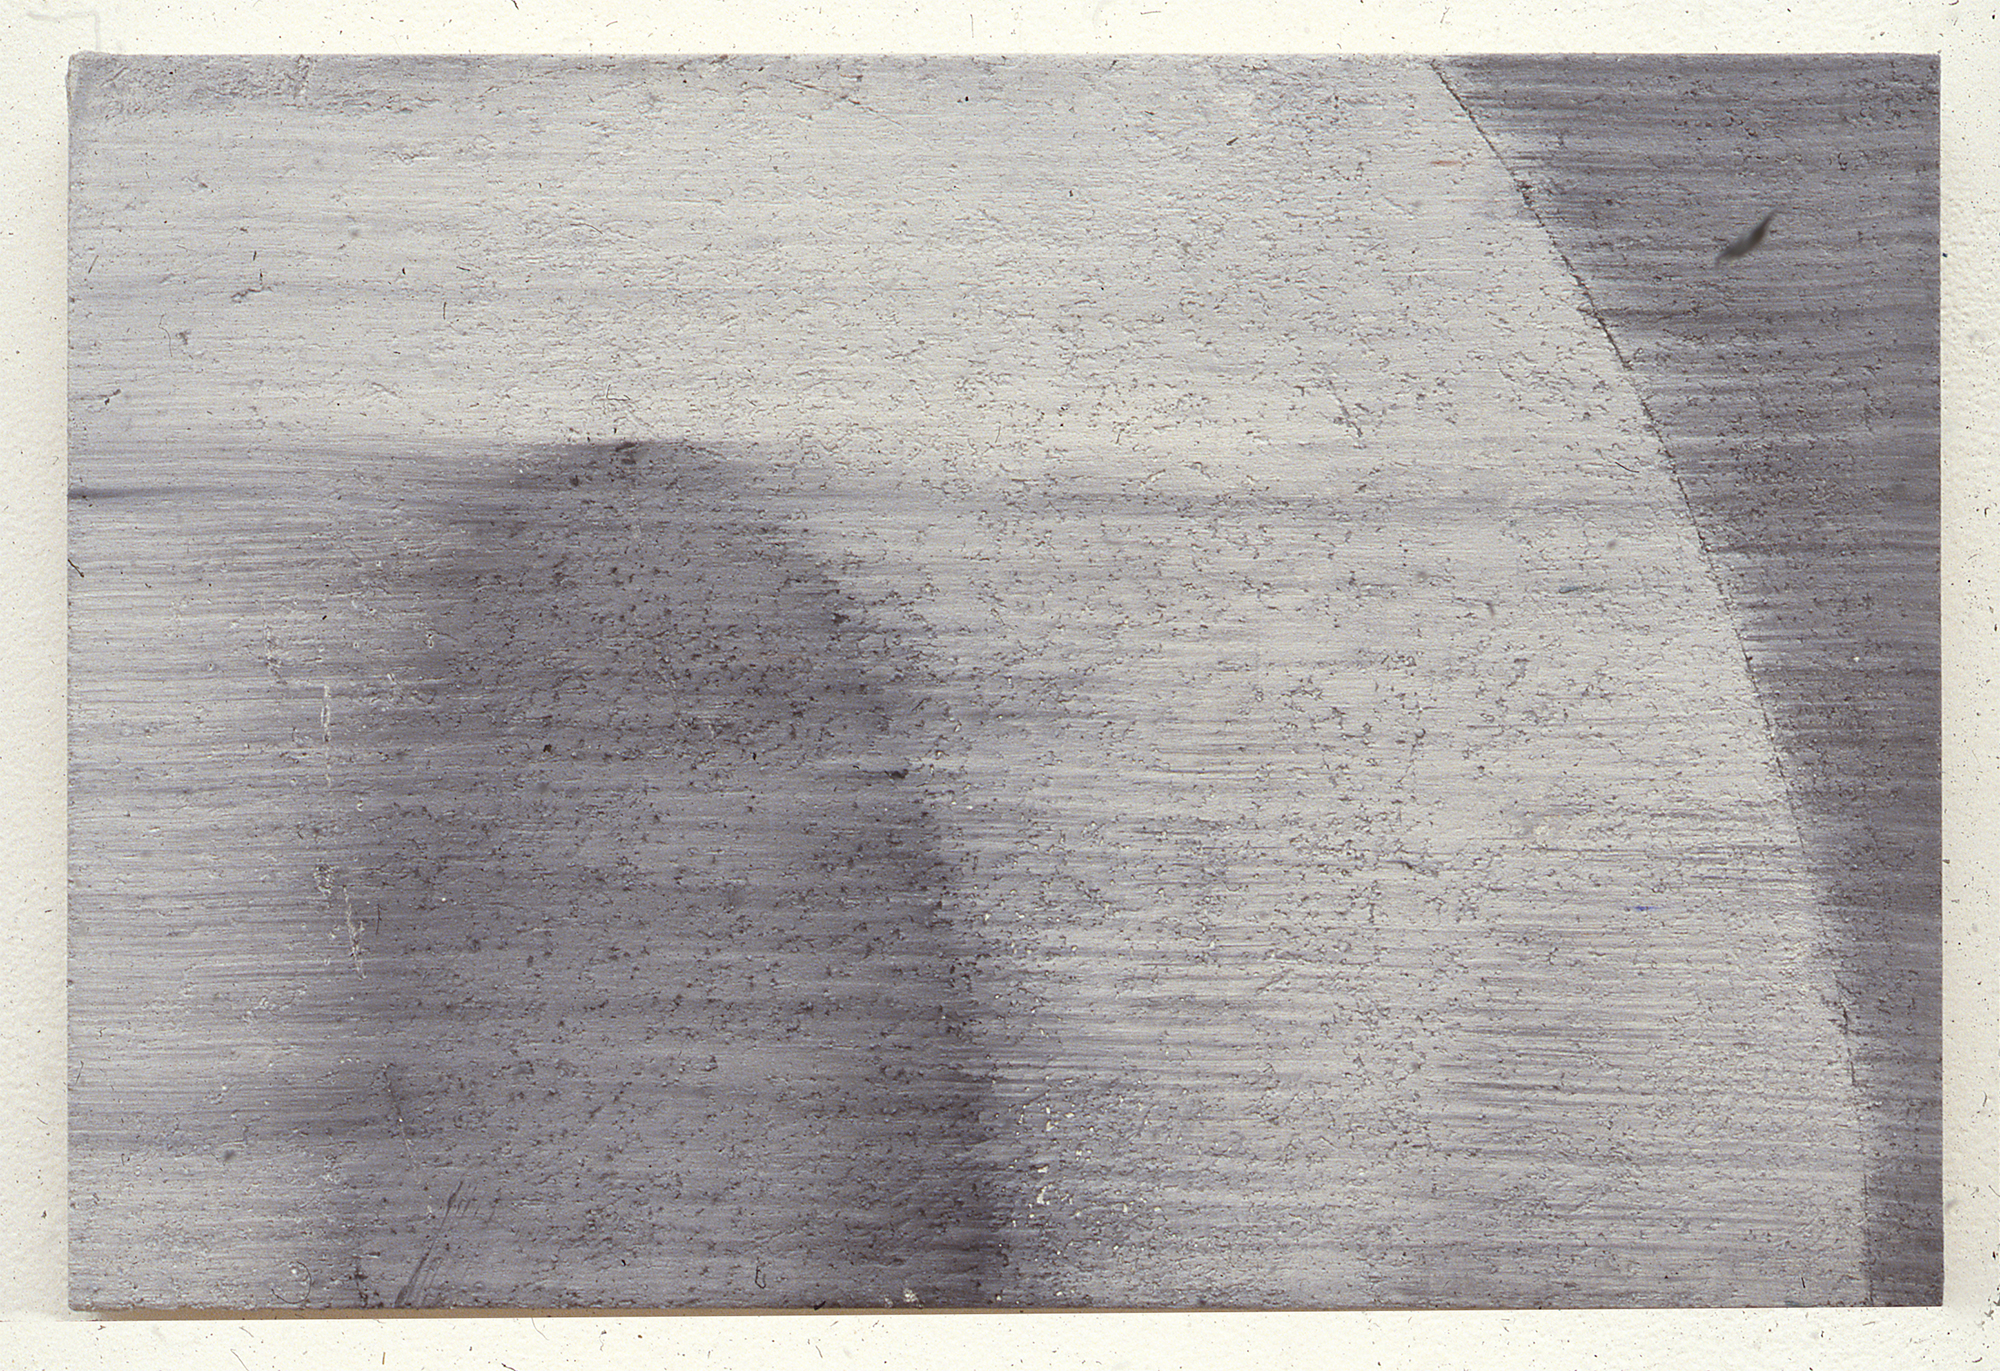 David Row - untitled (Fragment)